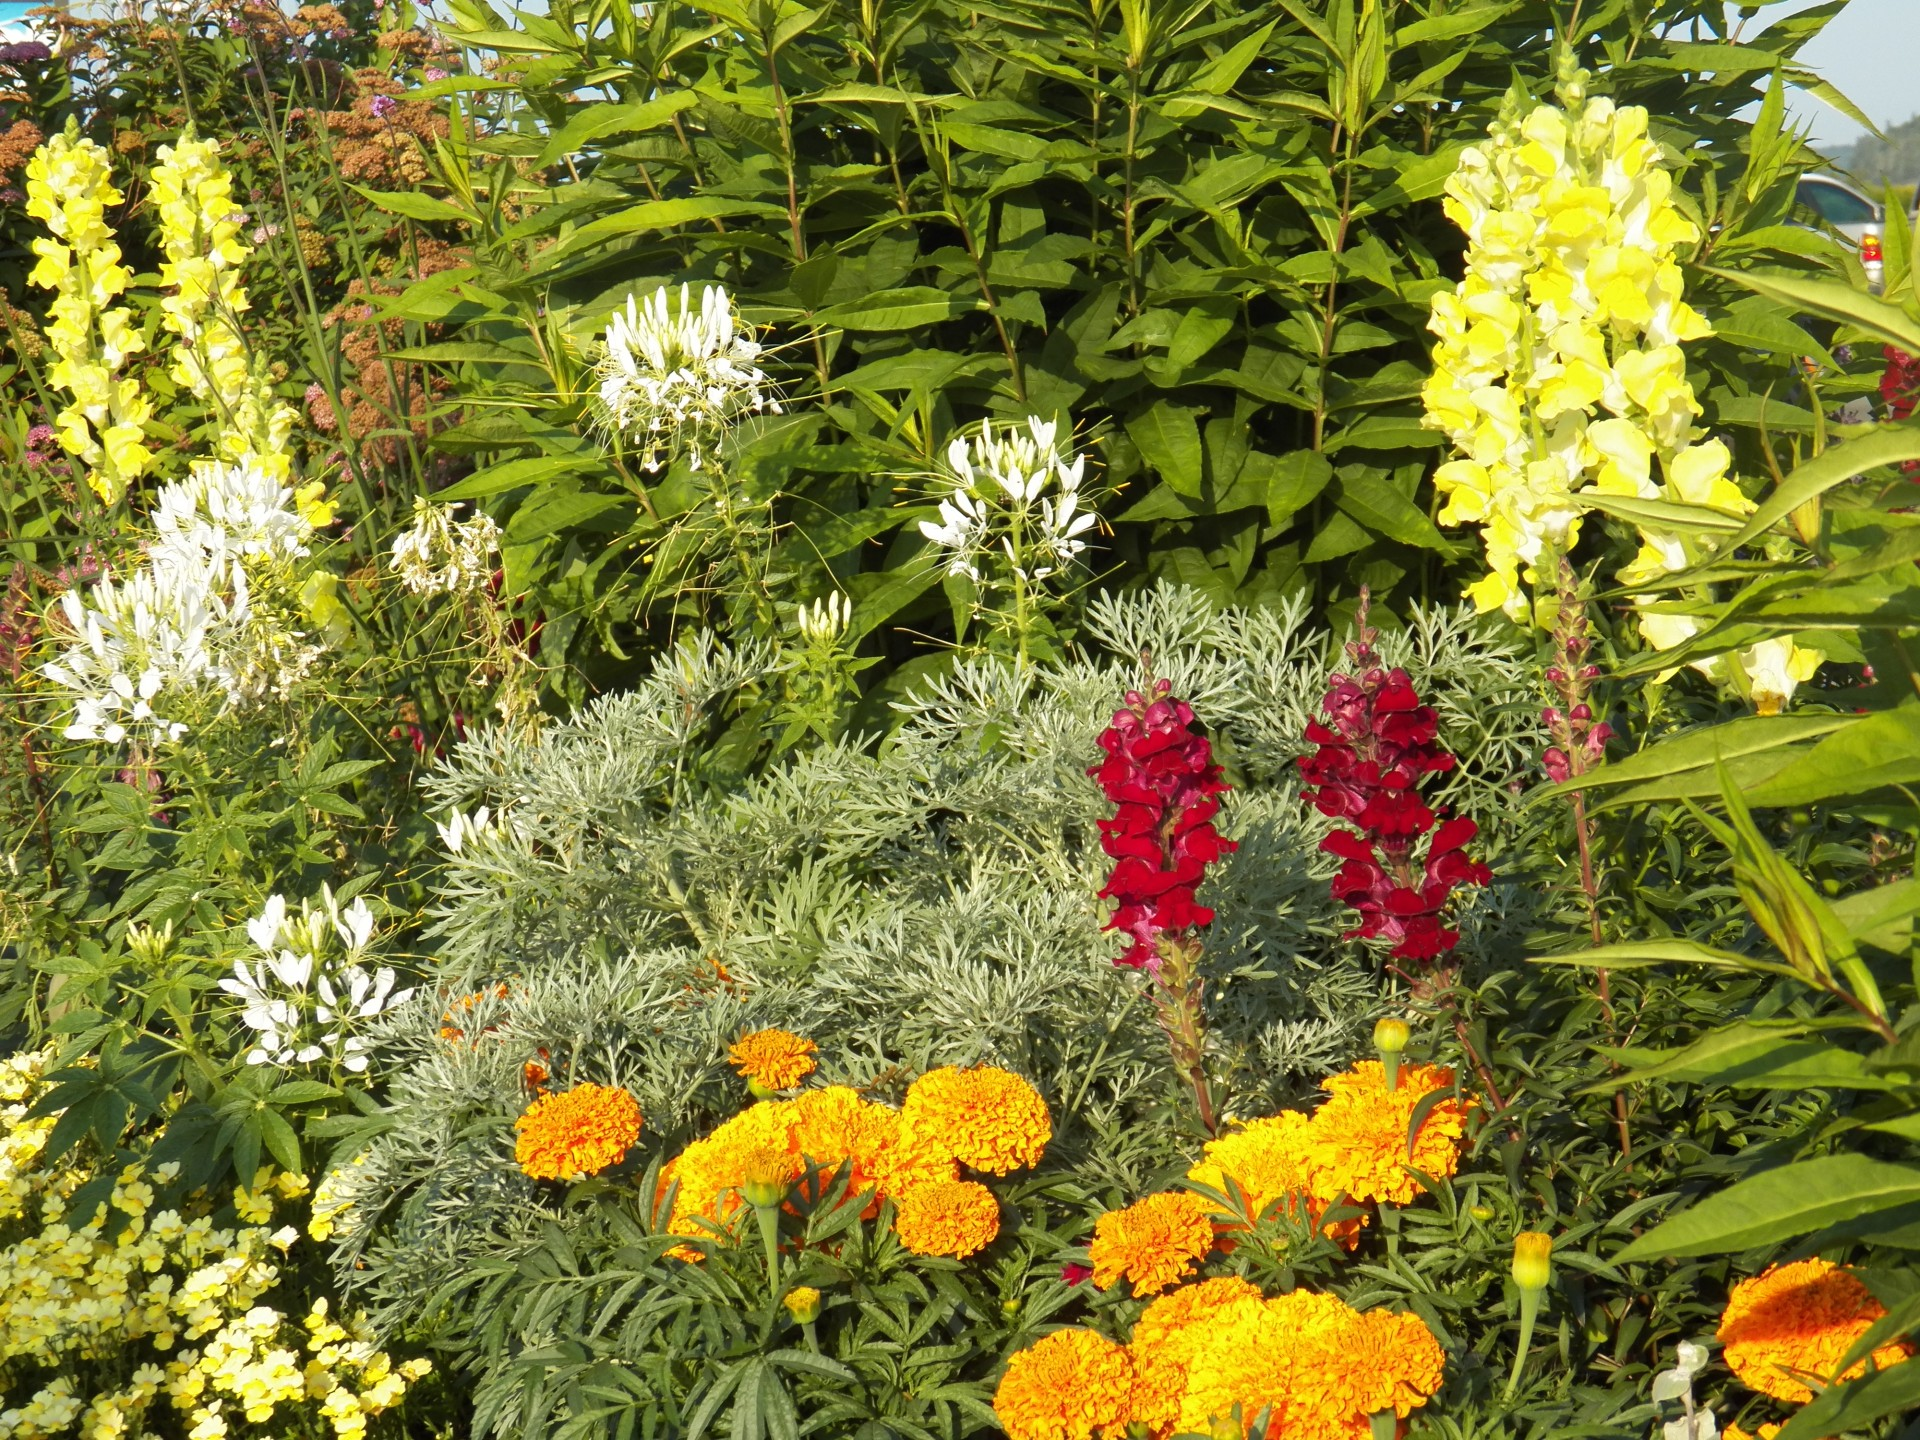 Gardening tips from Eamon in Dublin, Ireland